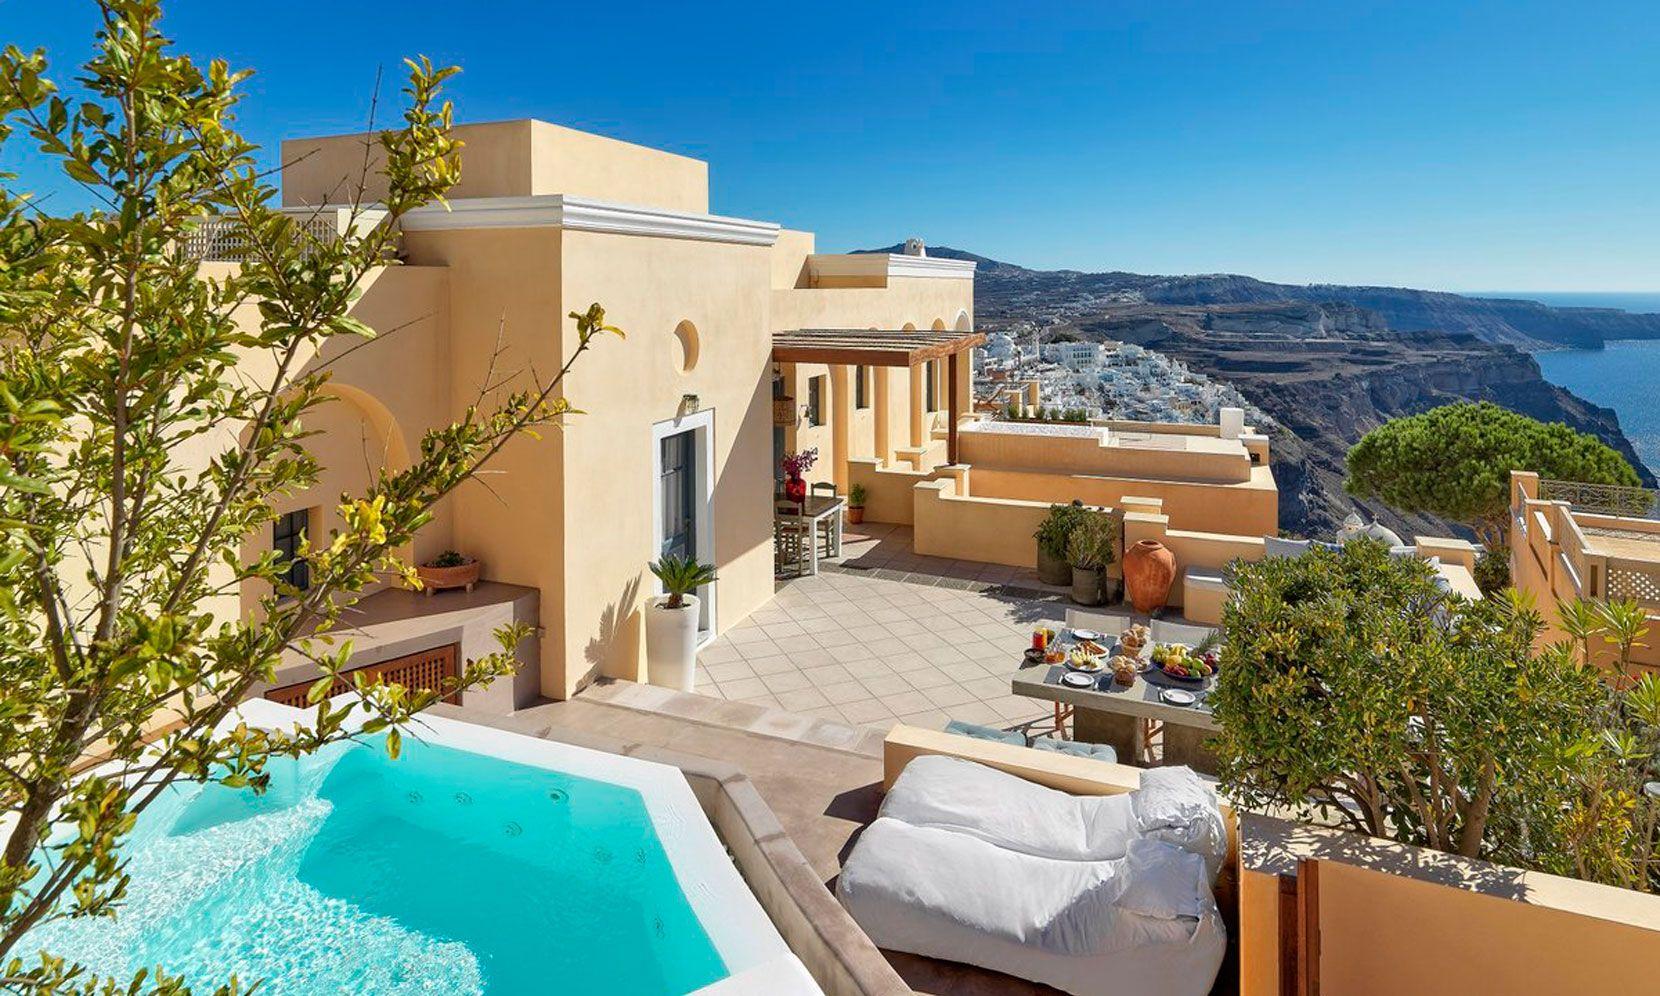 Santorini Luxury Villa Eros jumbotron image